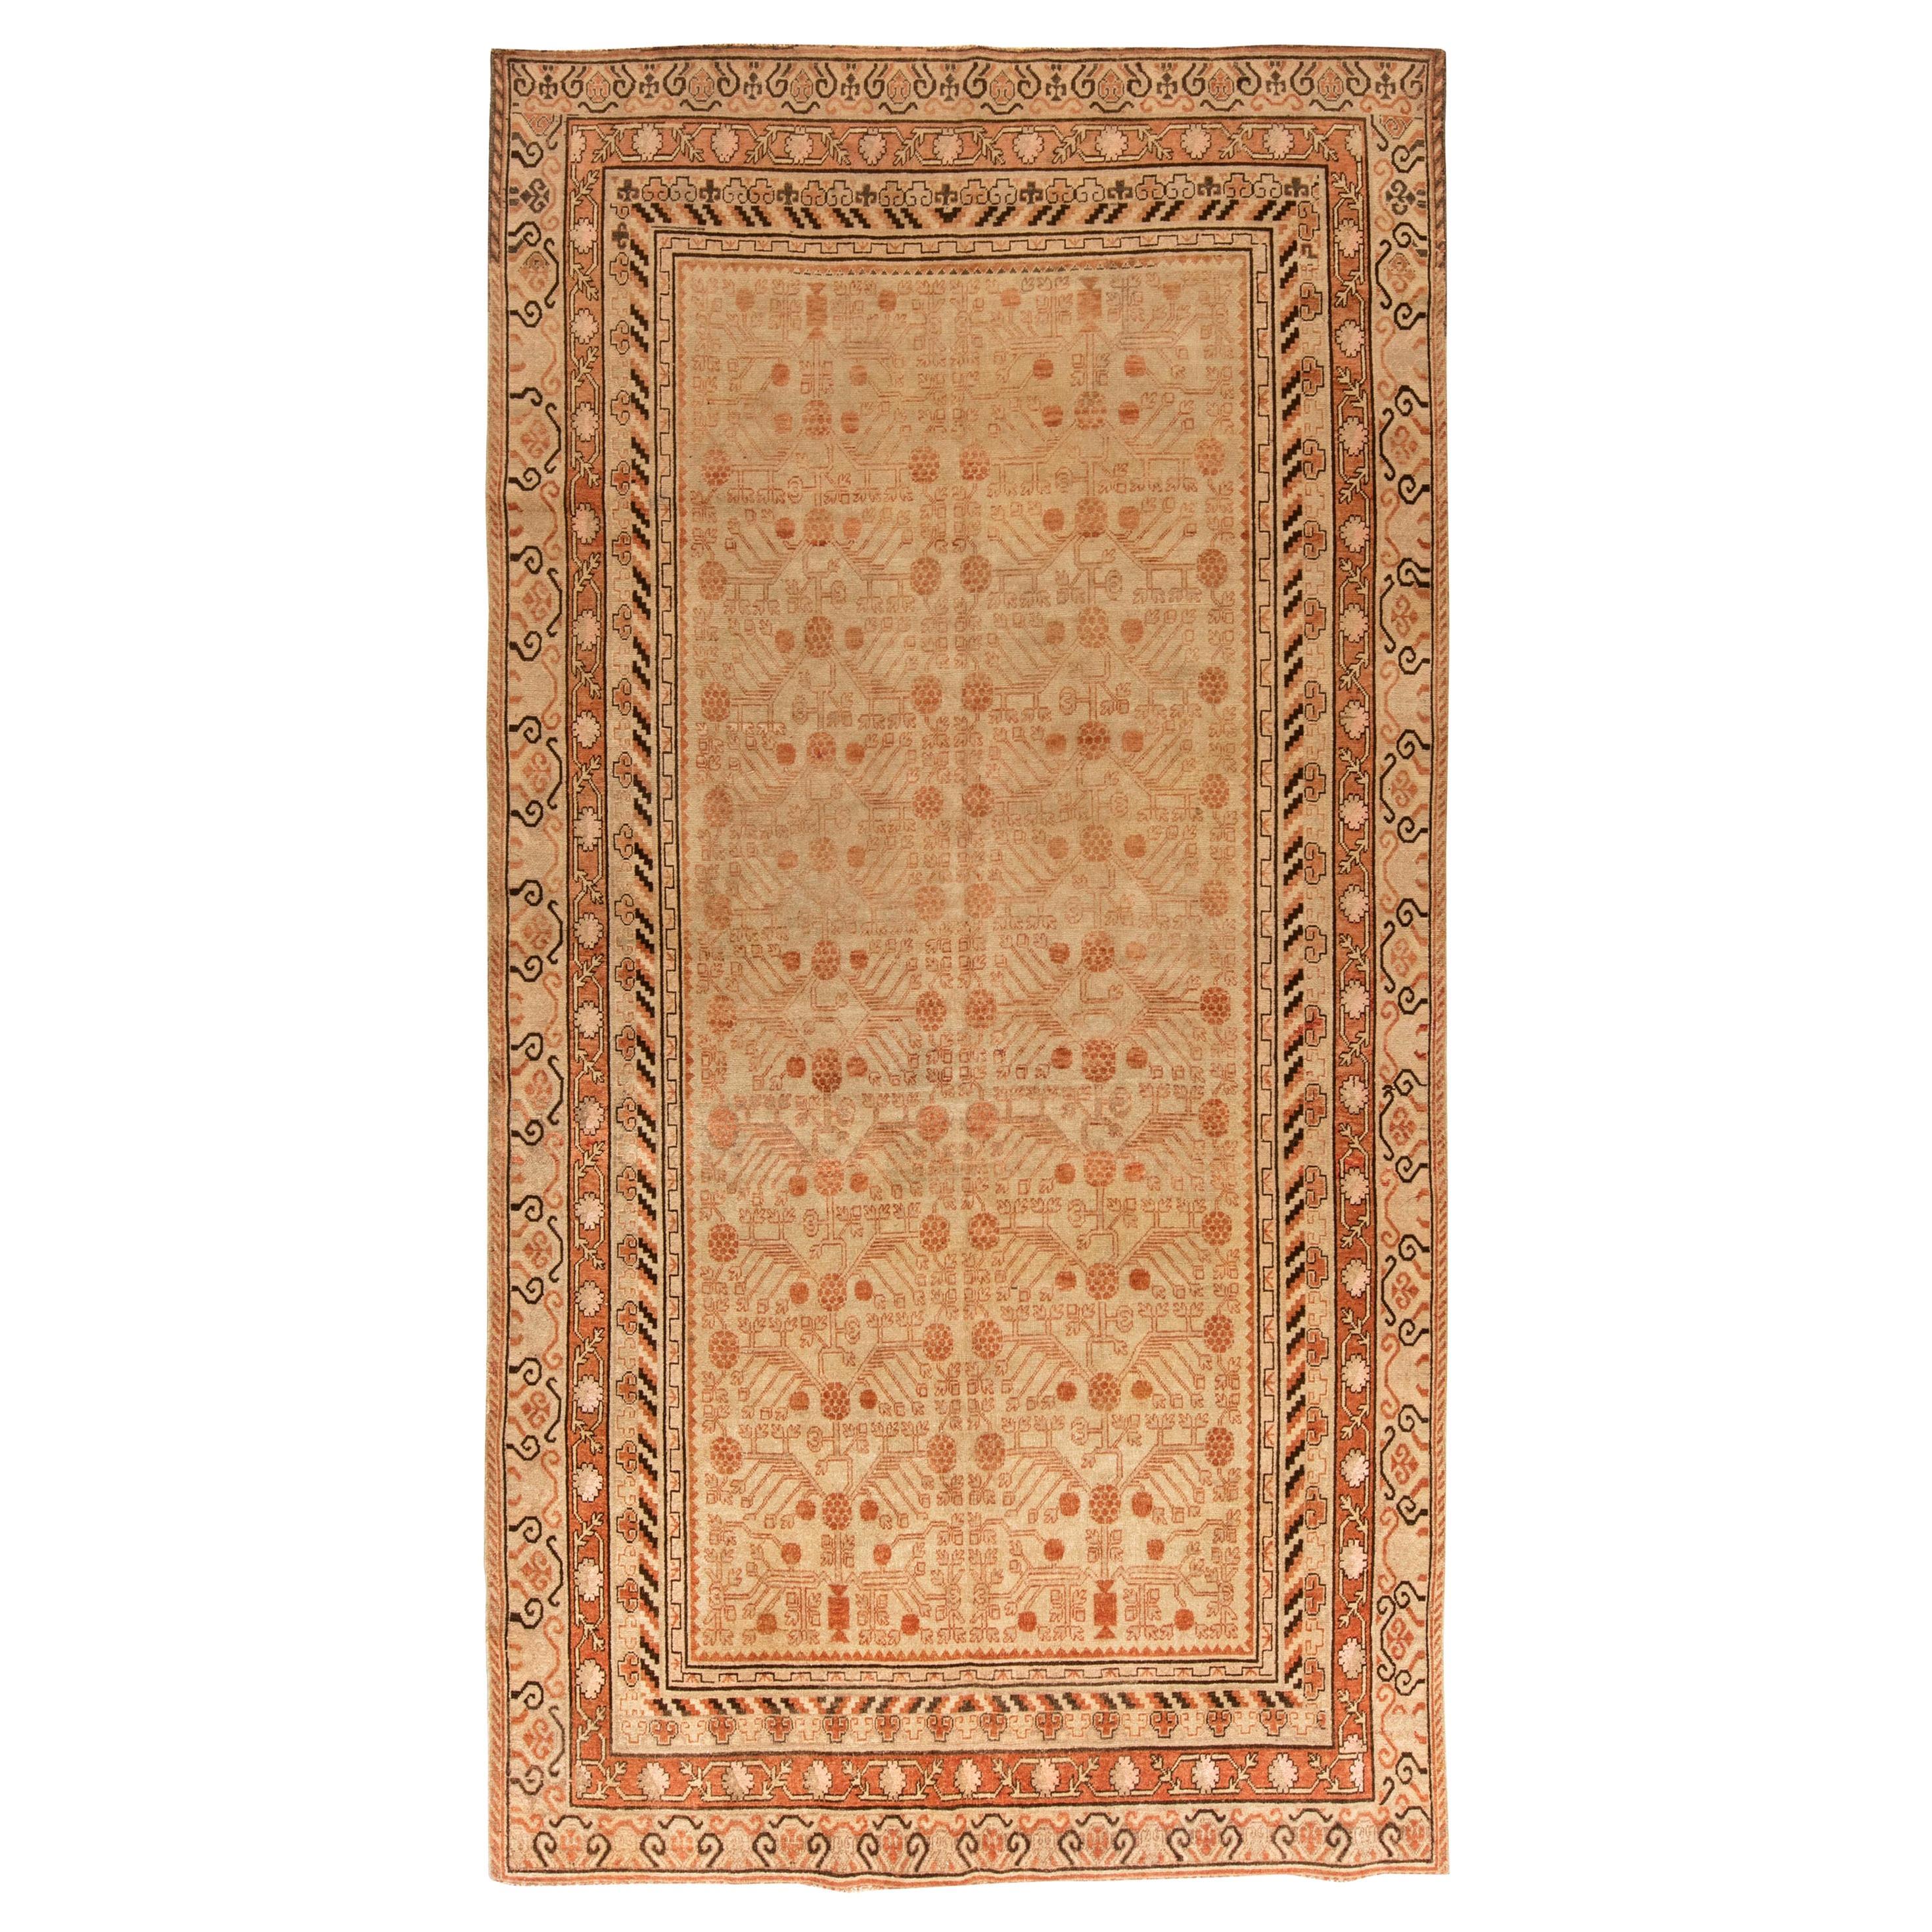 Midcentury Samarkand Caramel, Camel, Sandy Beige and Brown Handwoven Wool Rug